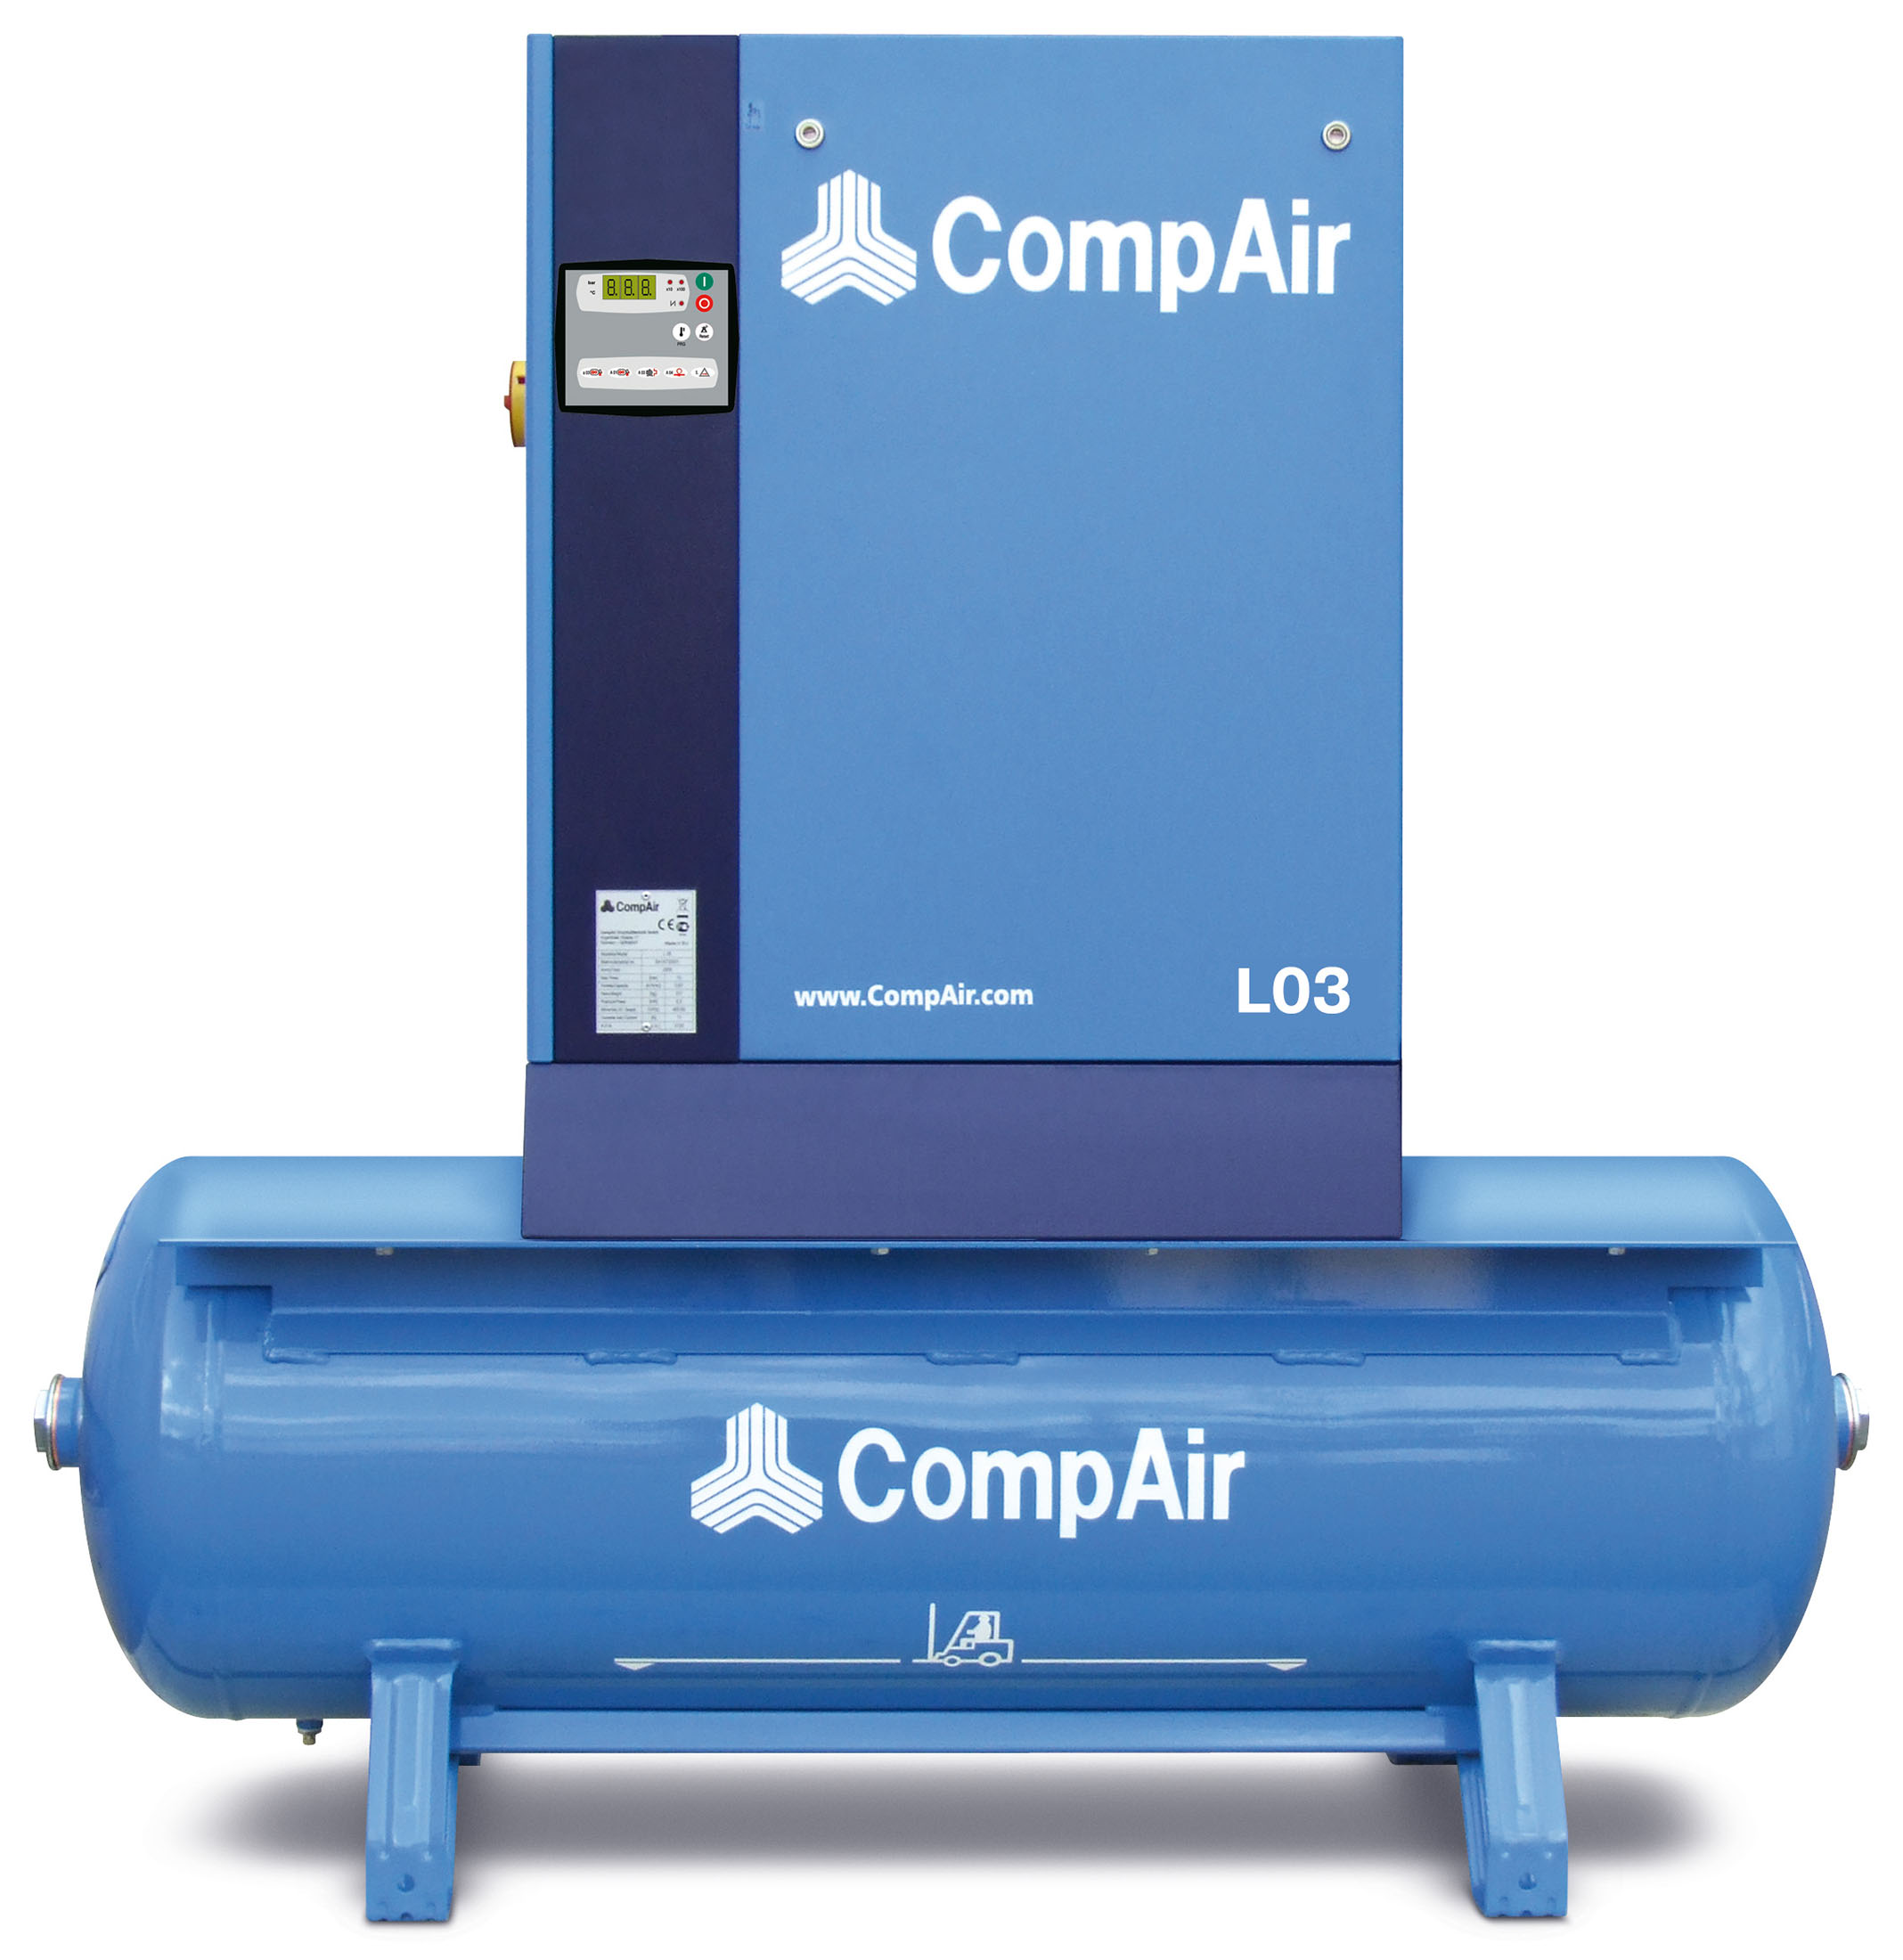 Midlands UK supplier of CompAir L03RM air compressor